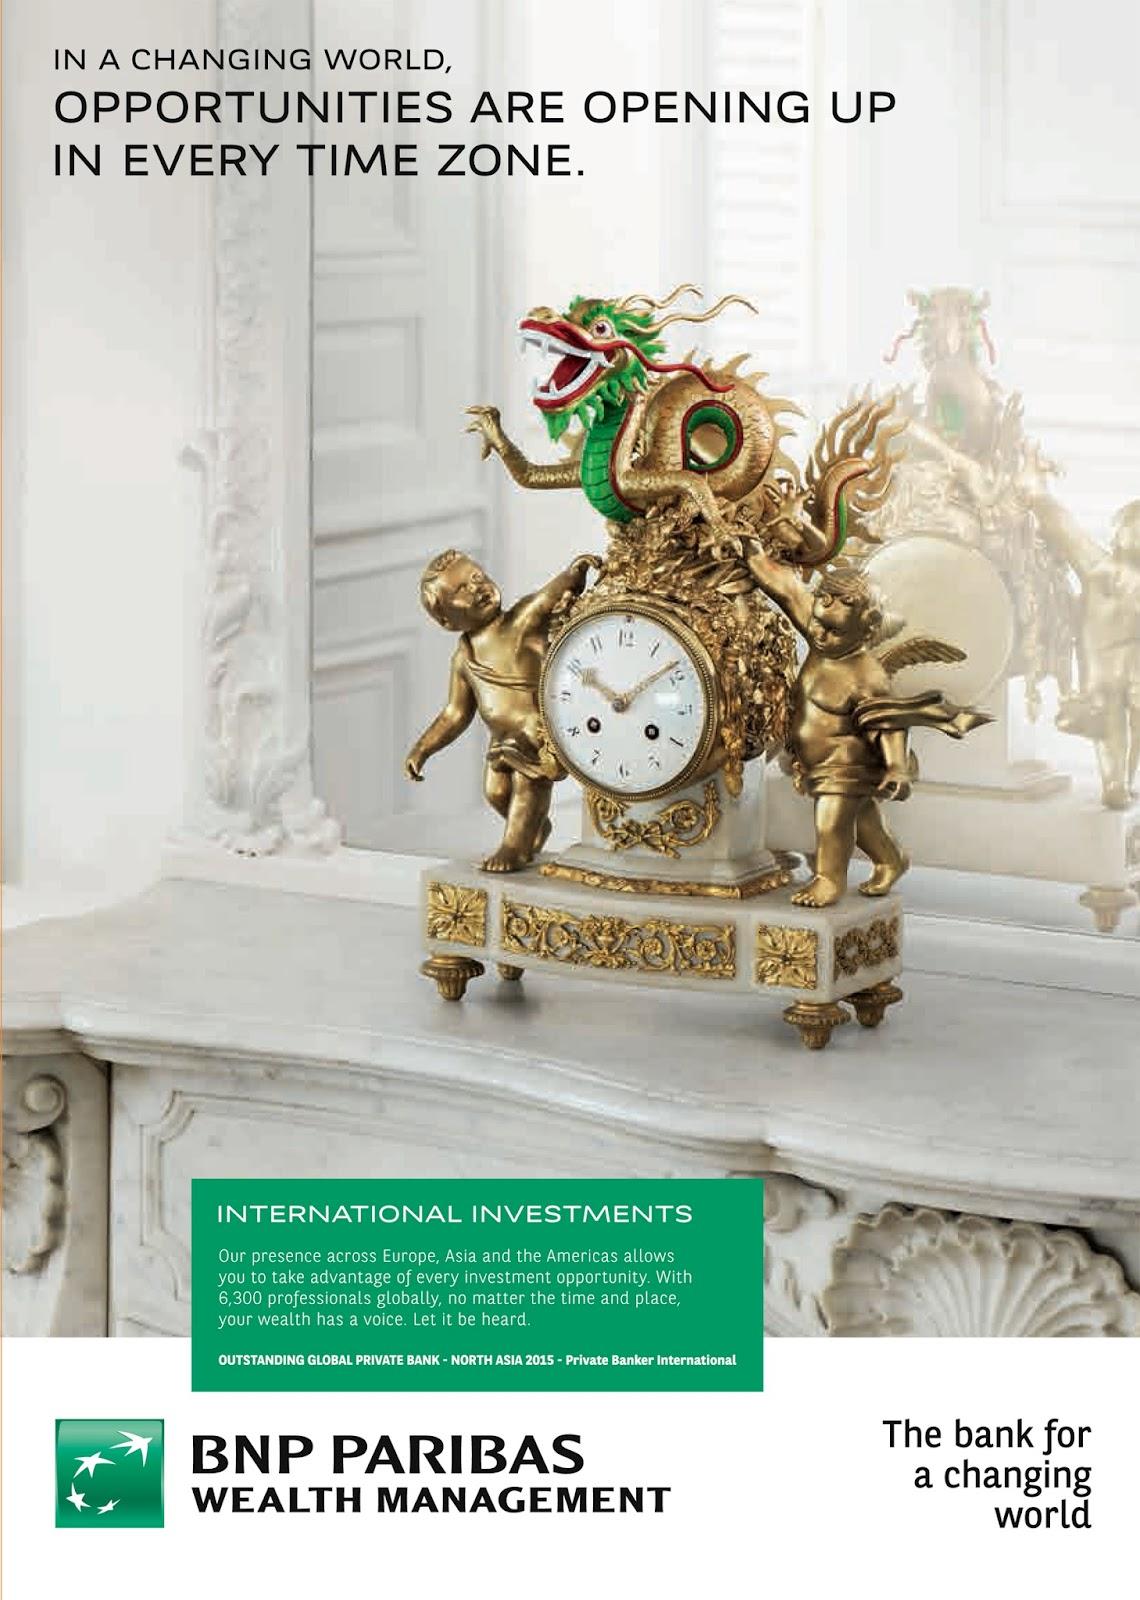 sylvain bossut cr ation d 39 objets pour une campagne bnp. Black Bedroom Furniture Sets. Home Design Ideas